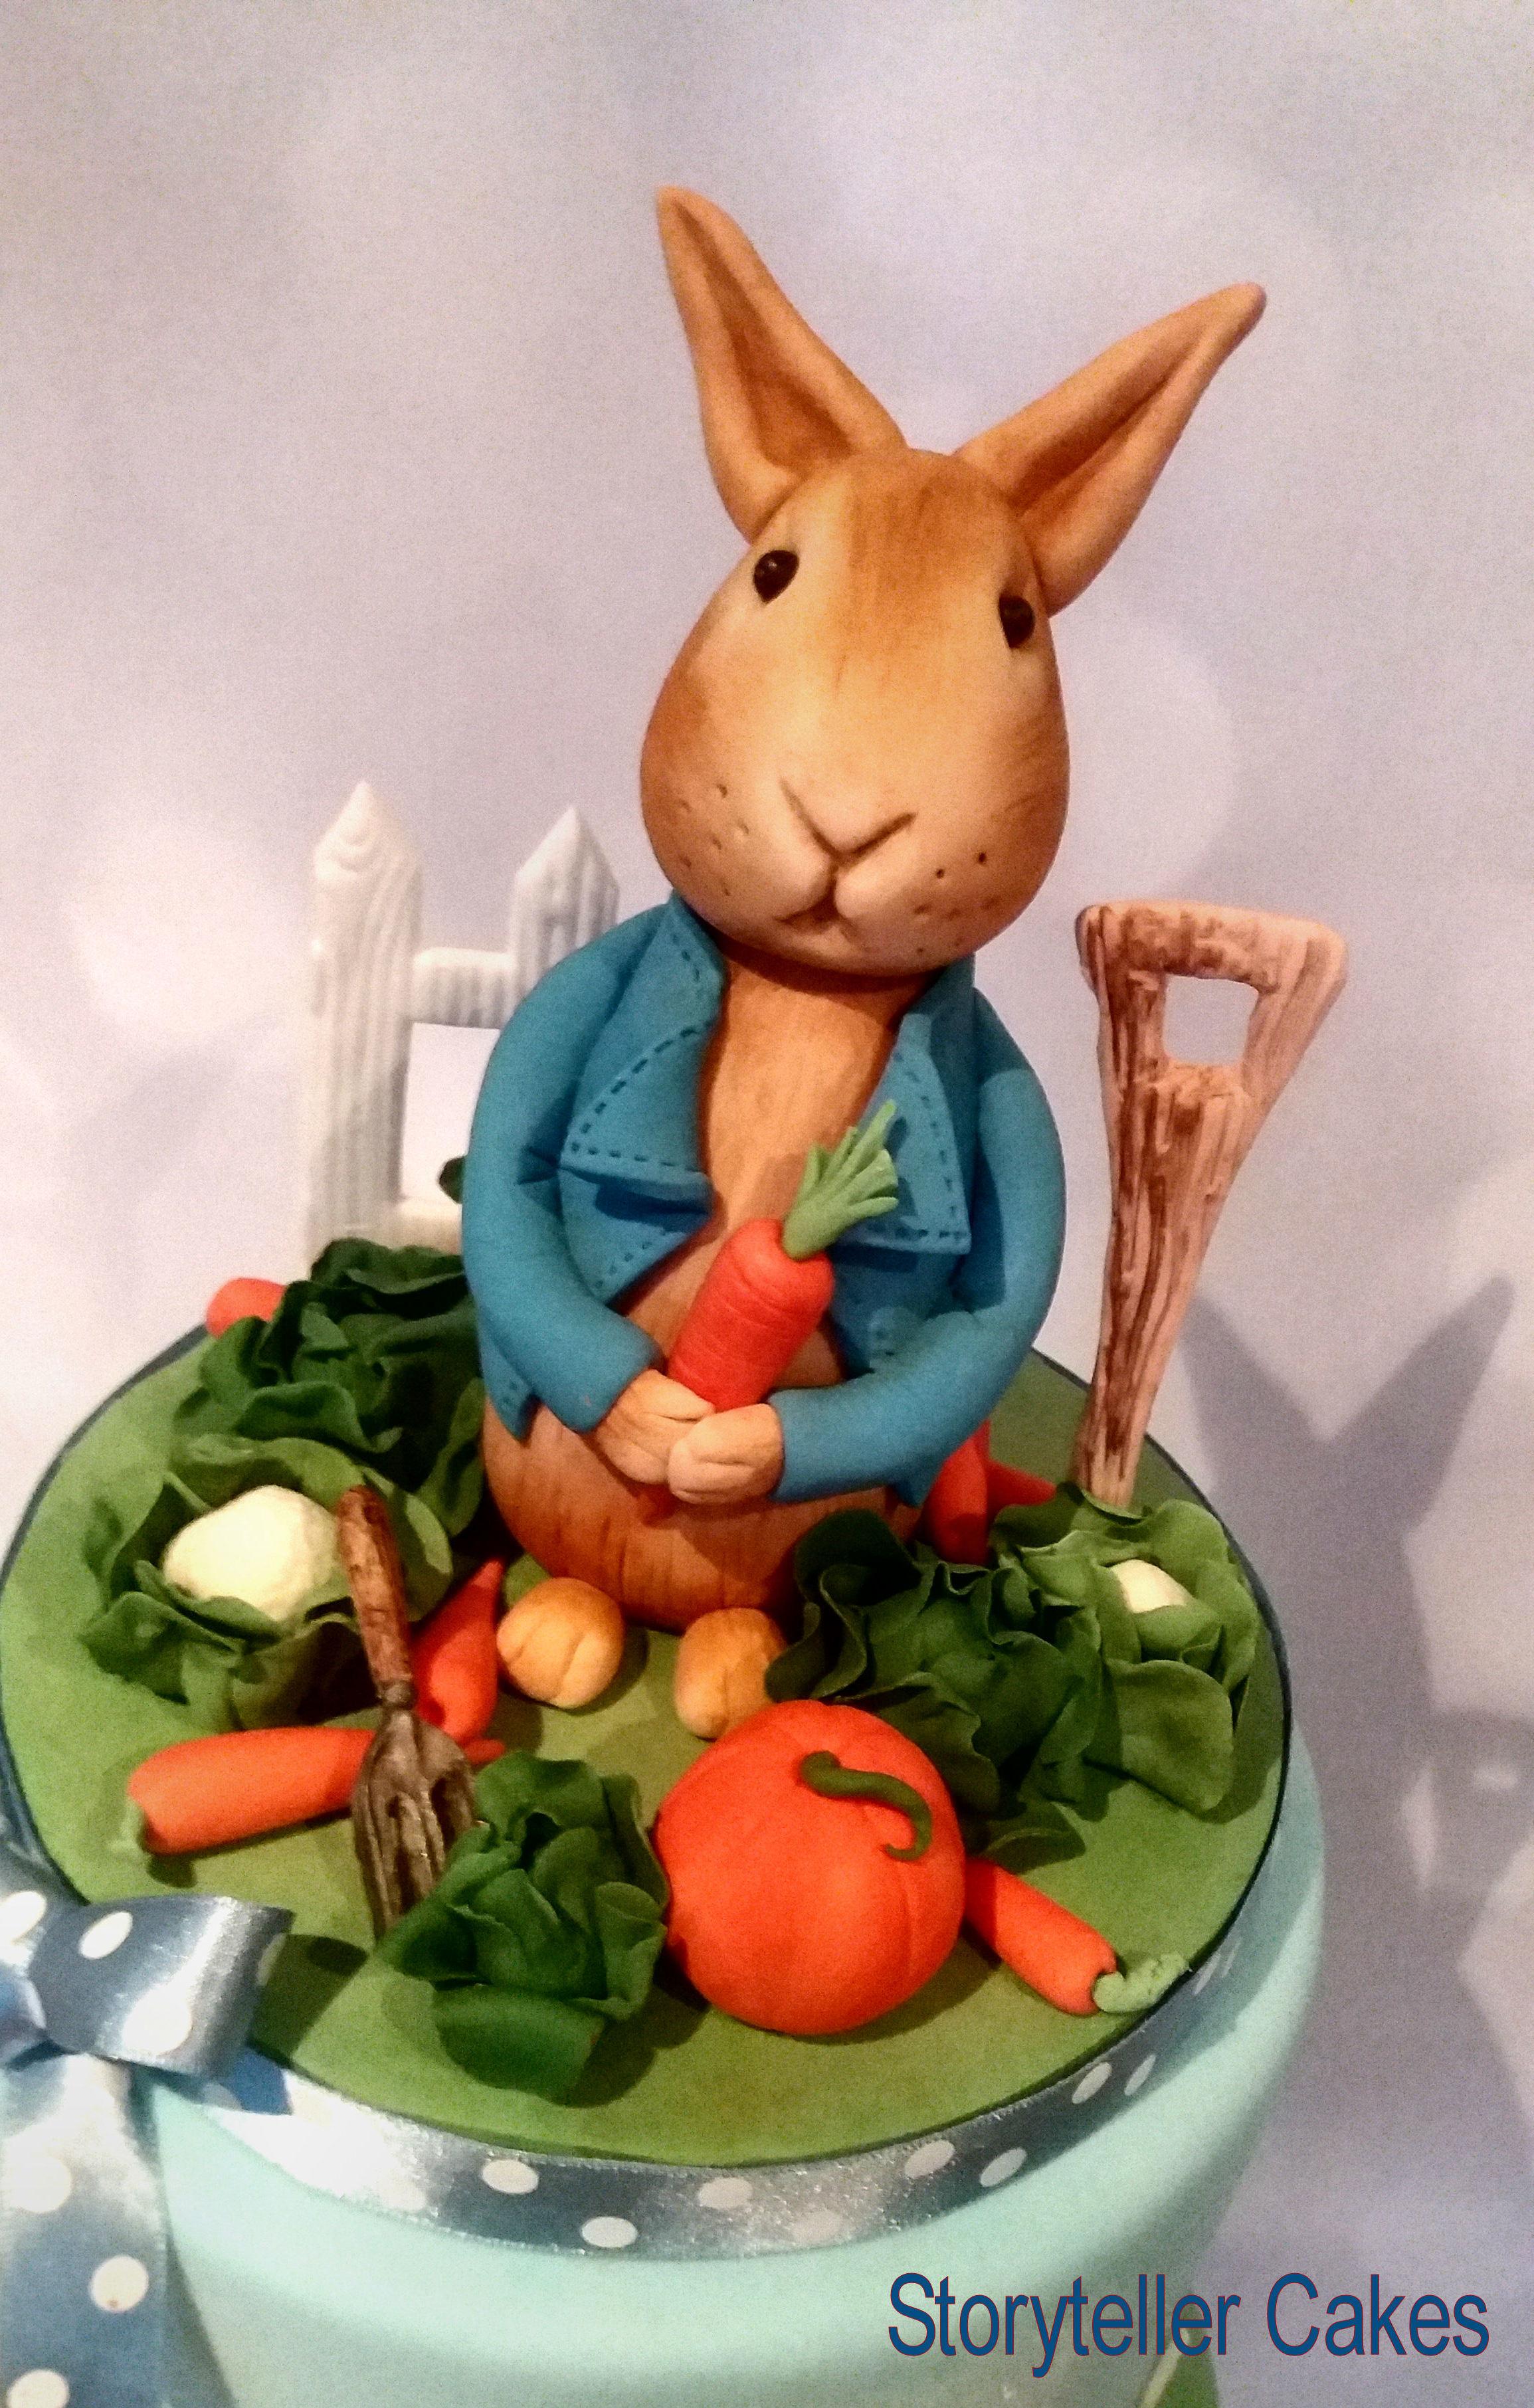 peter rabbit cake 2.jpg